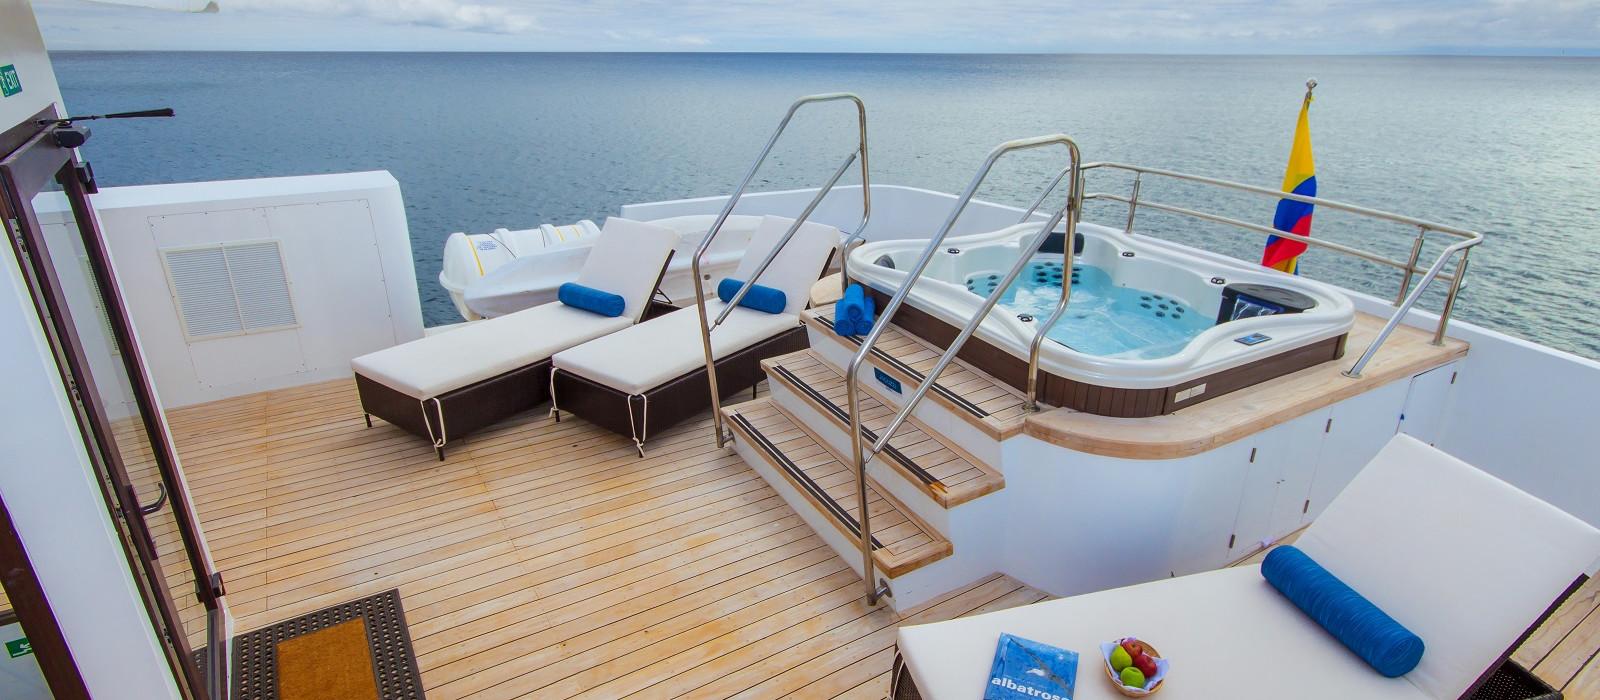 Hotel Natural Paradise Ecuador/Galapagos